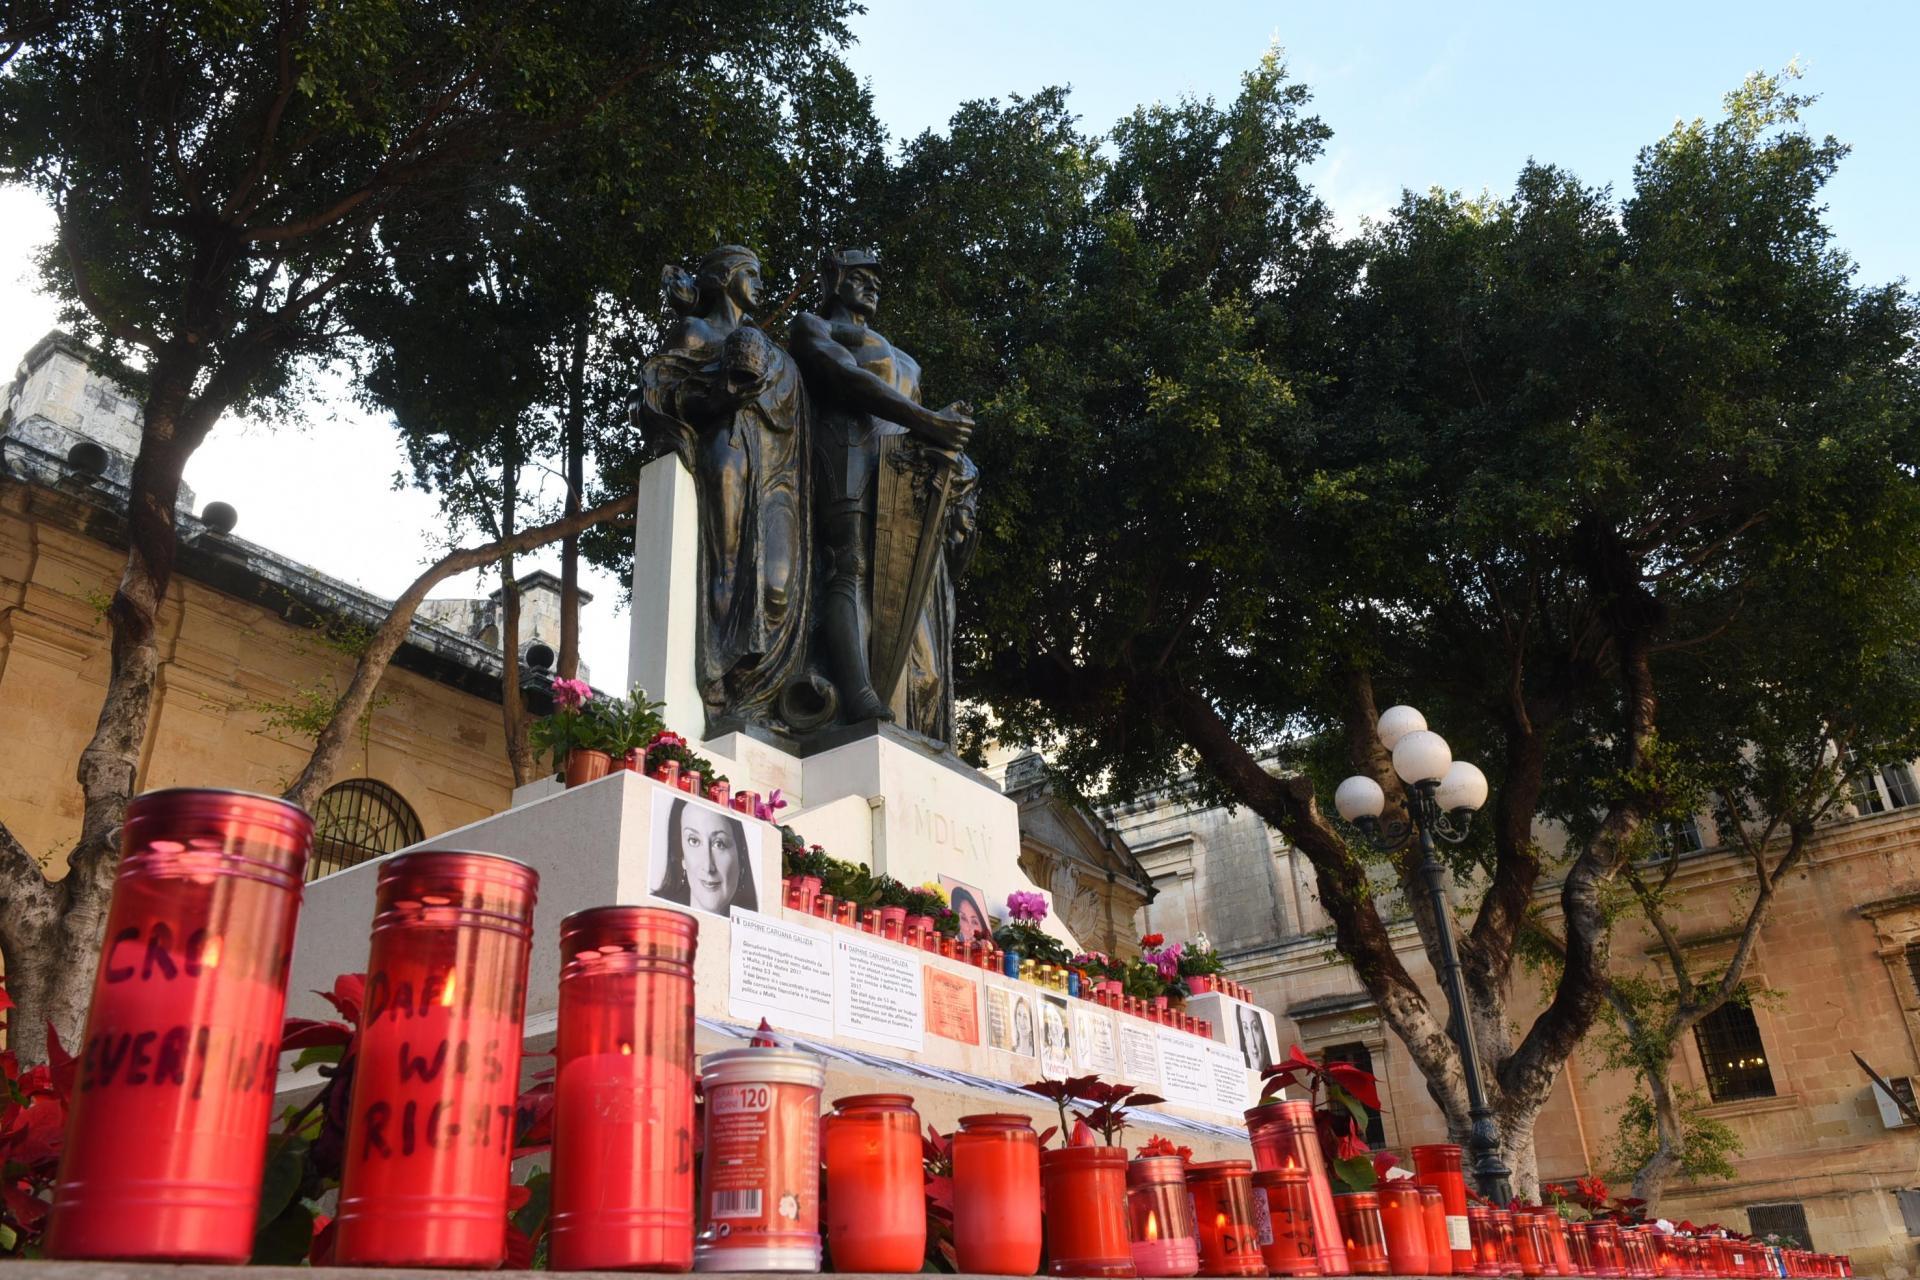 The memorial to murdered journalist Daphne Caruana Galizia. Photo: Chris Sant Fournier